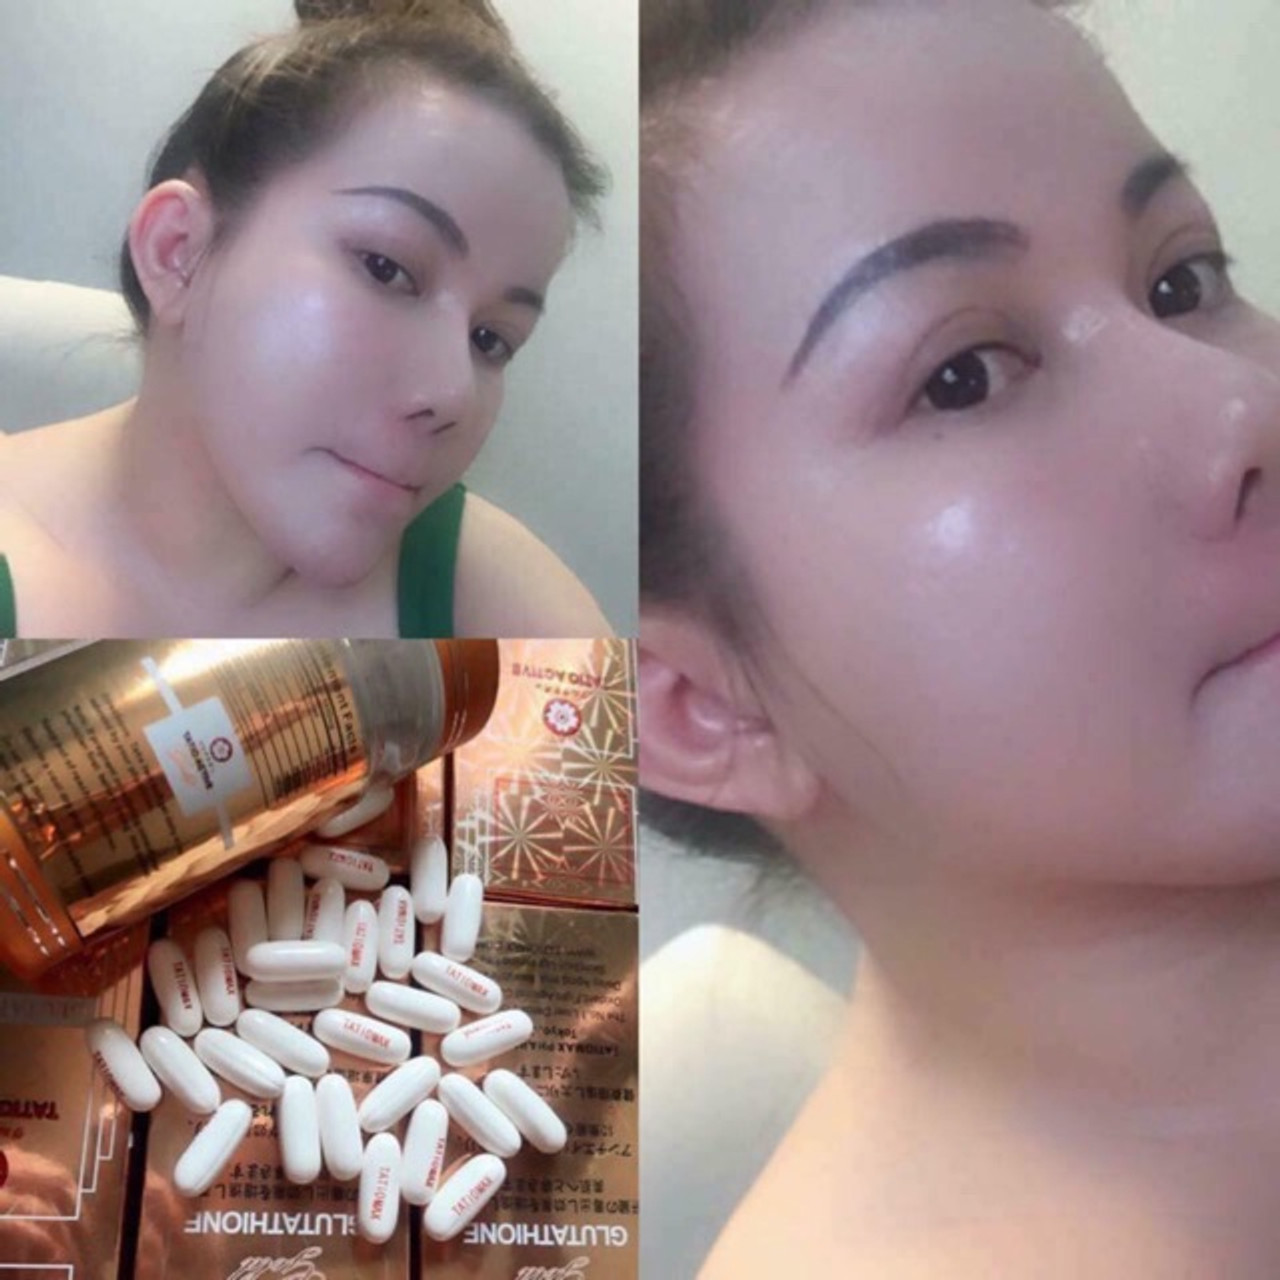 TATIO ACTIVE Gold 1850mg L-Glutathione Skin Whitening Capsules & RELUMINS Vitamin C 60 Capsules